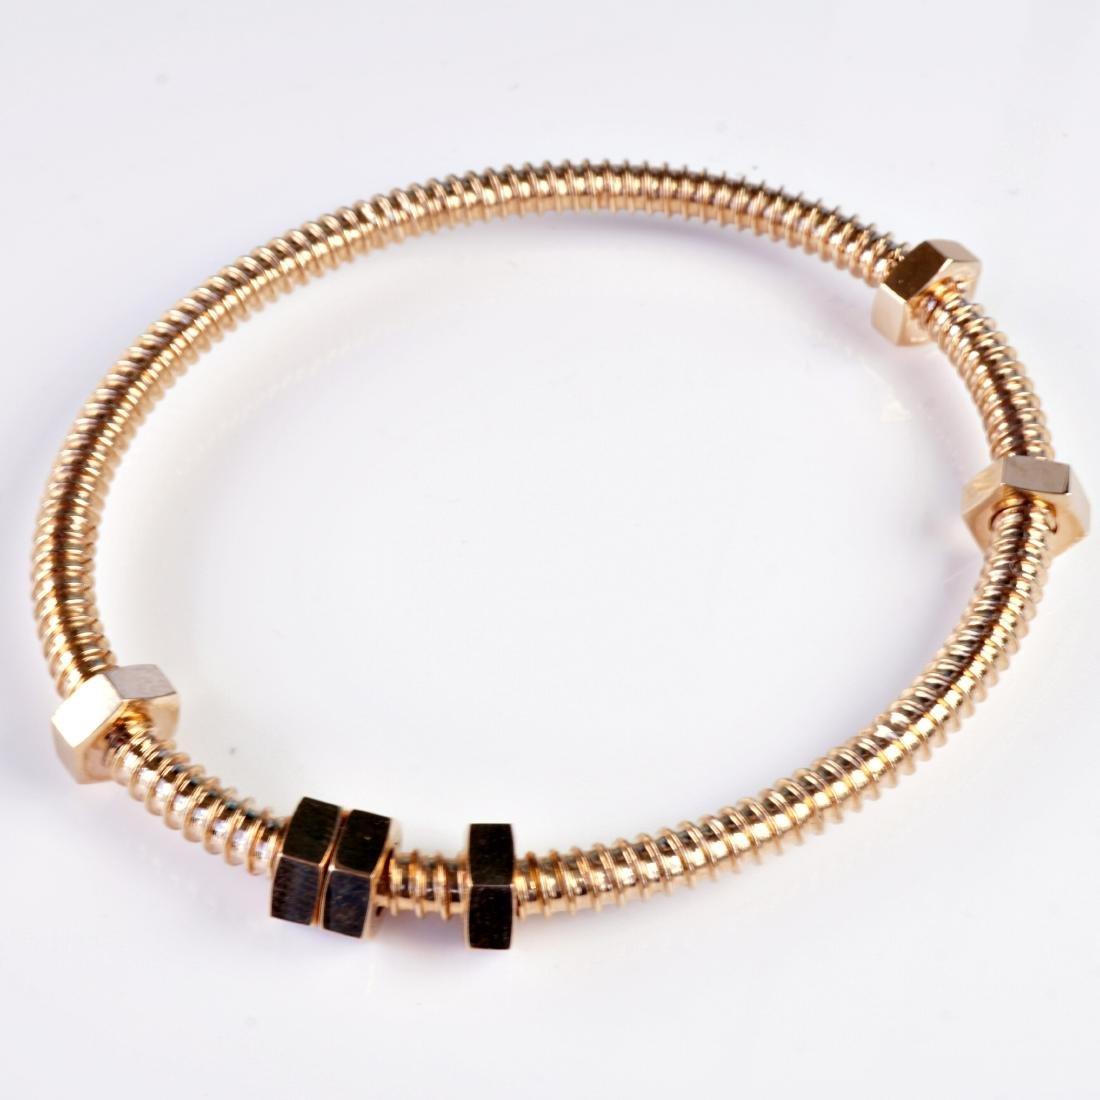 18k RG Bracelet in the Manner of Cartier